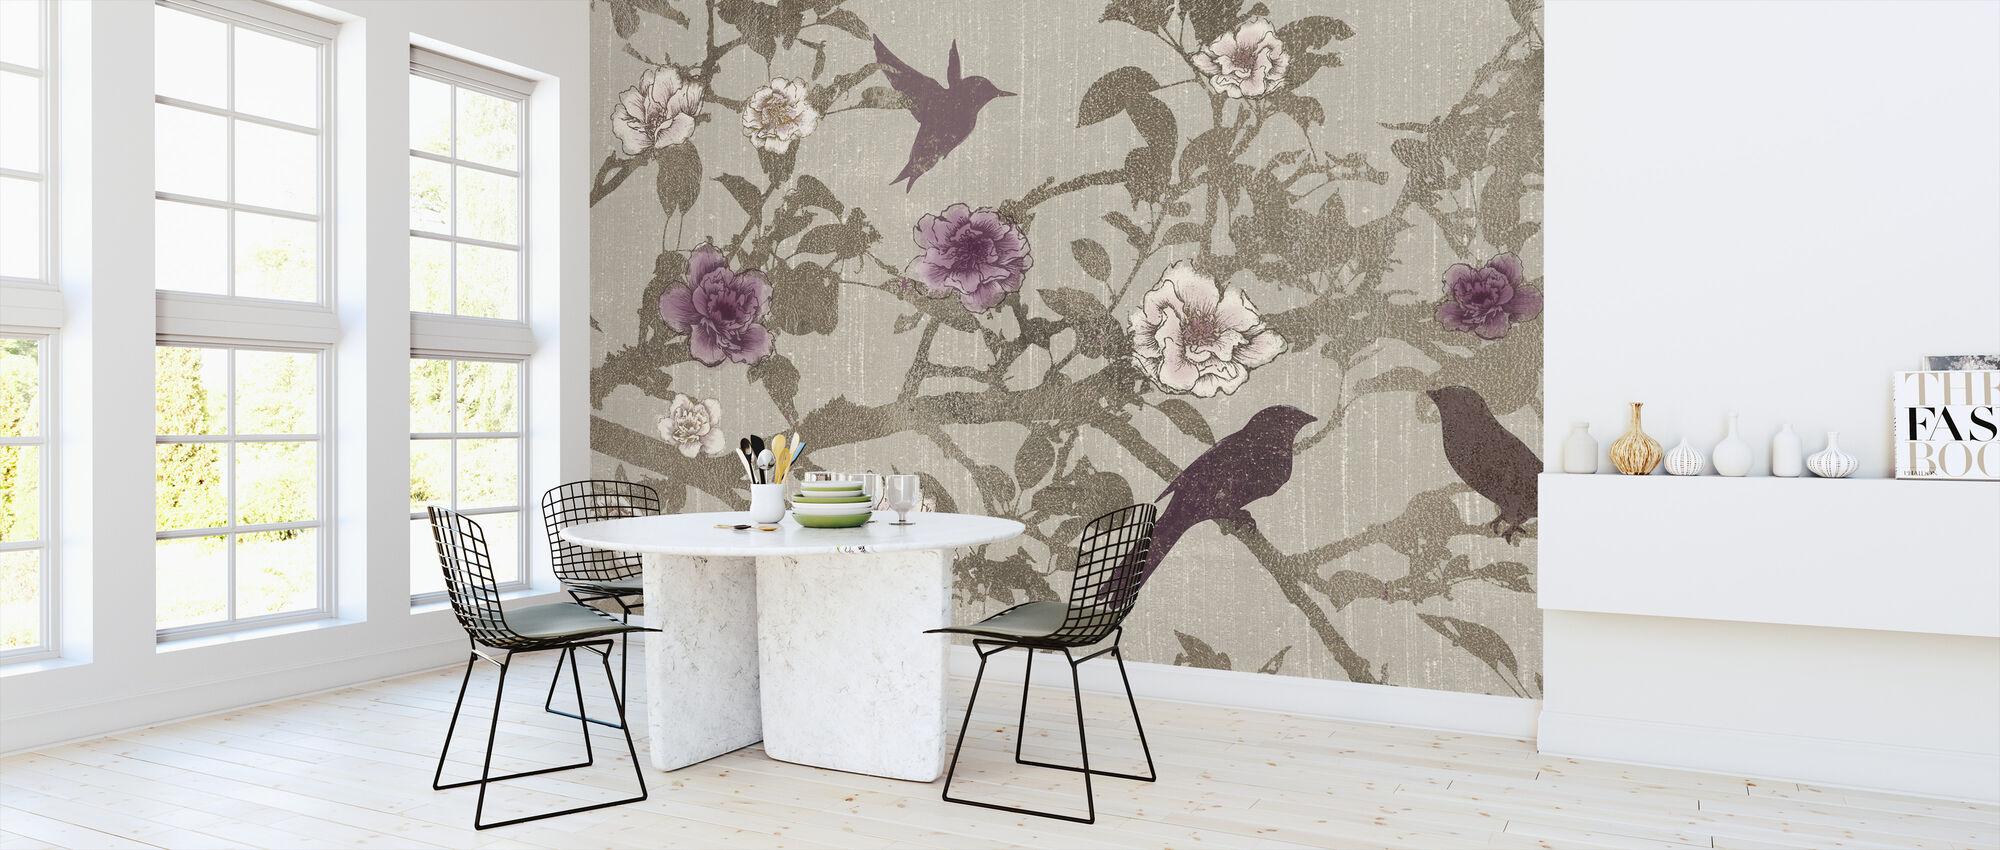 Gilded Branches - Wallpaper - Kitchen